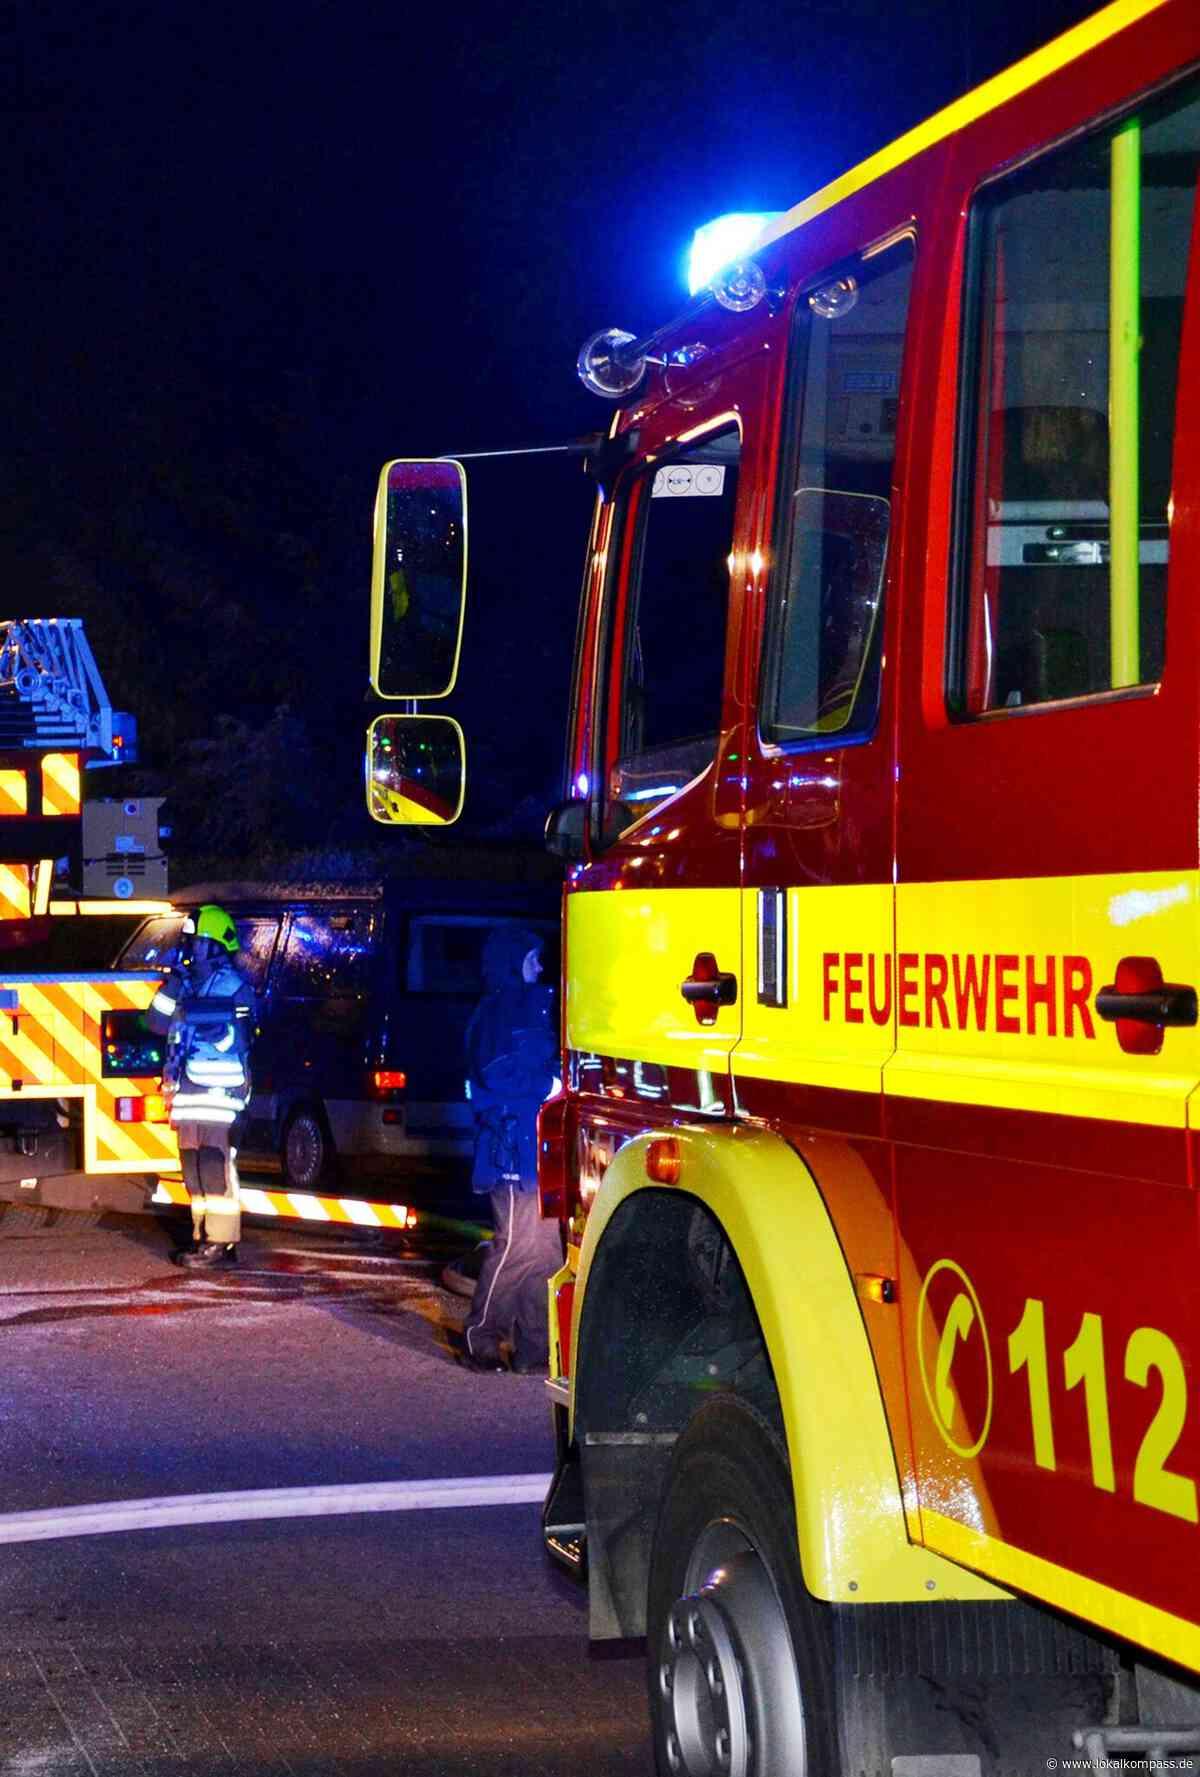 Polizei Langenfeld sucht Zeugen: Feuer im Industriegebiet - Lokalkompass.de